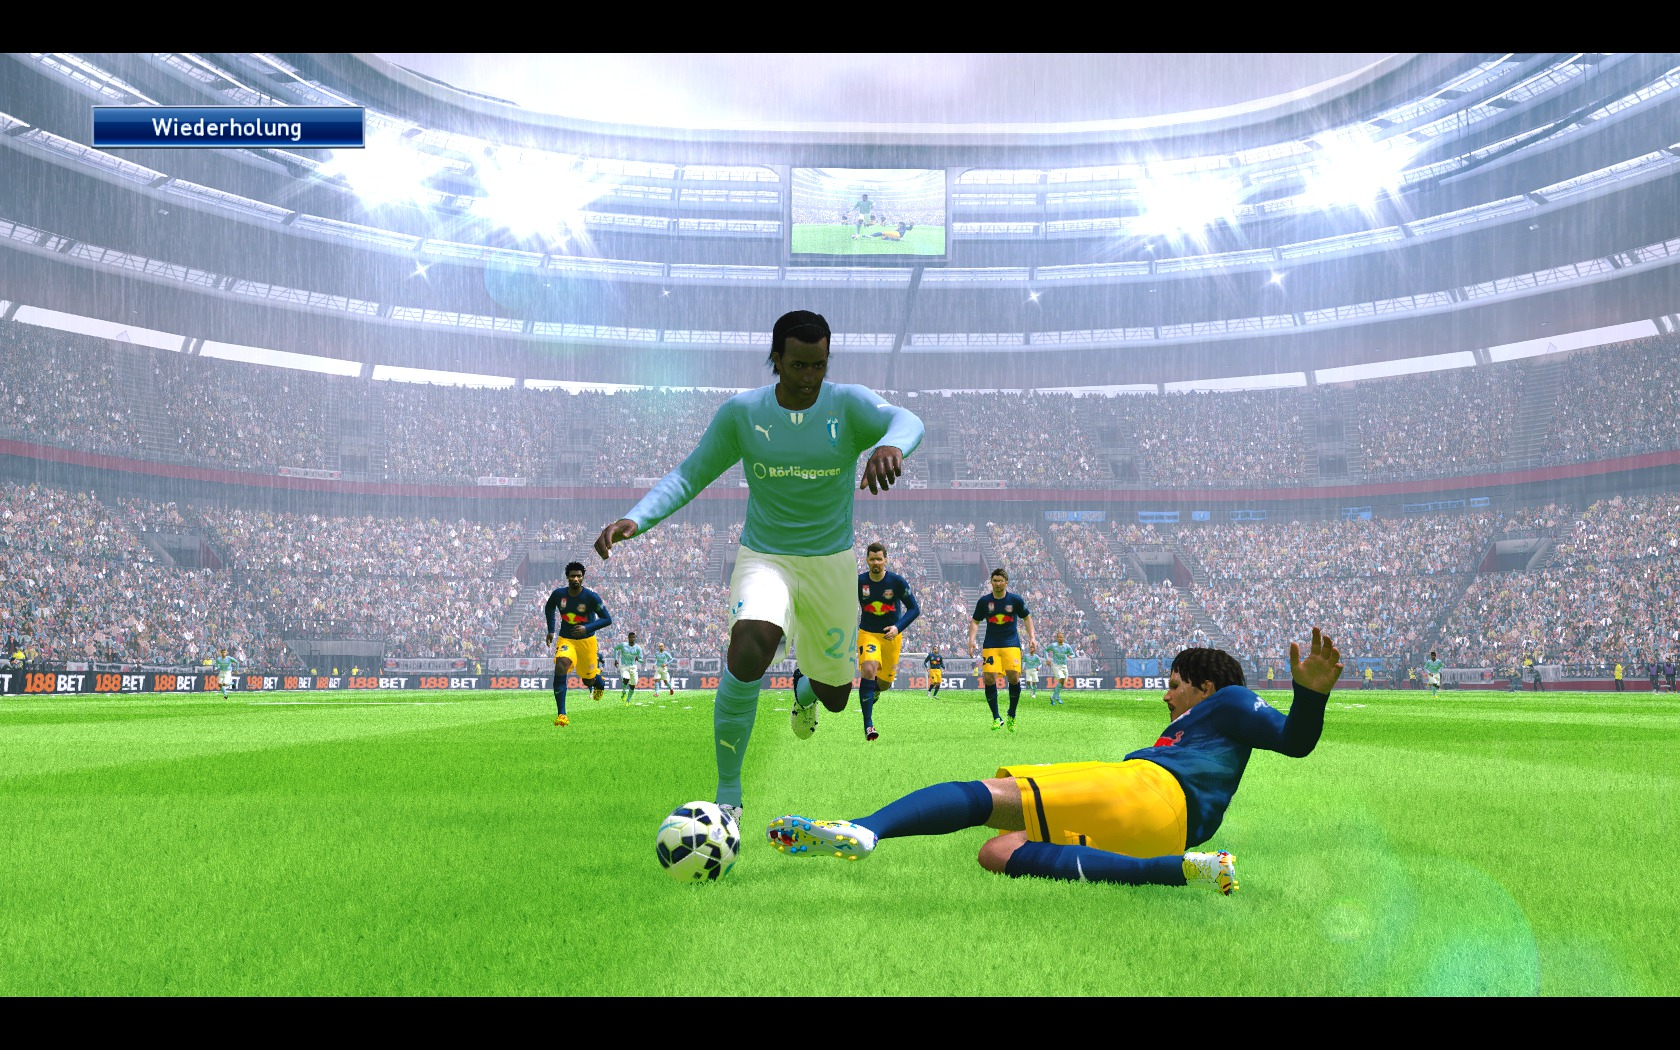 Pes6 patch 2015 gameplay gta